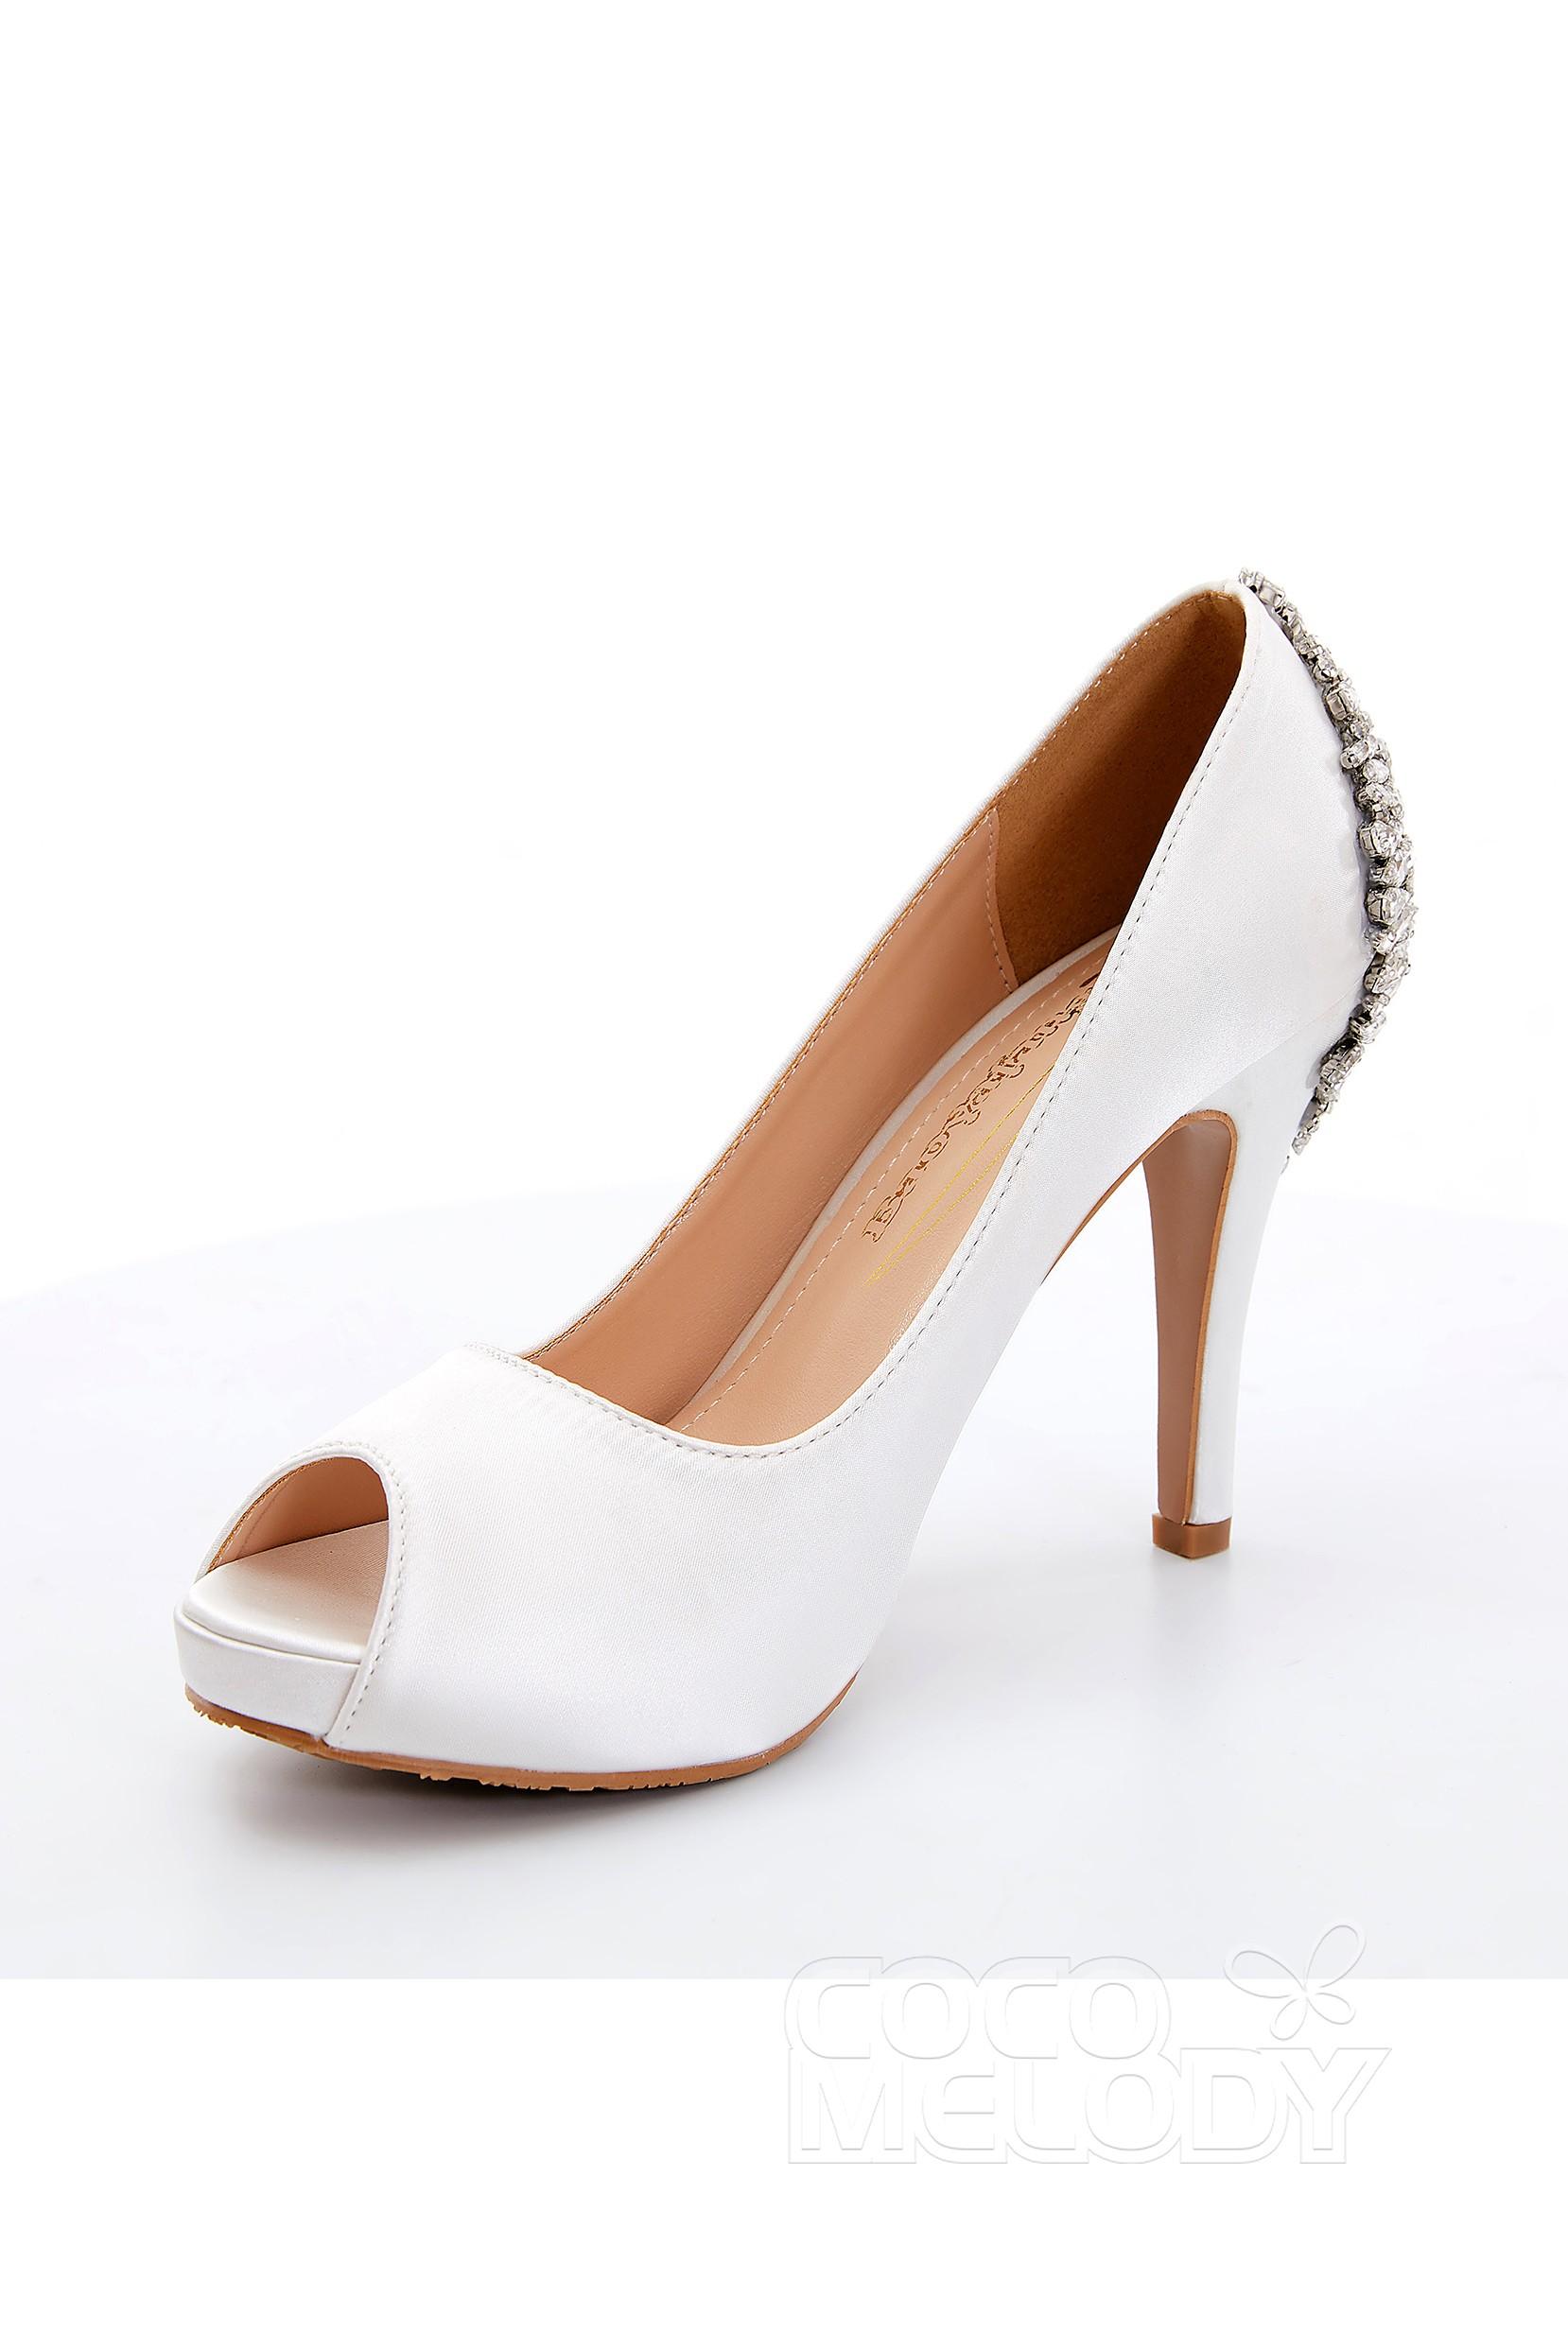 d42834c0ac0 Stiletto Heel 10.5cm Heel 1.5cm Platform Satin Rhinestone Peep Toe Bridal  Shoes SWS18001